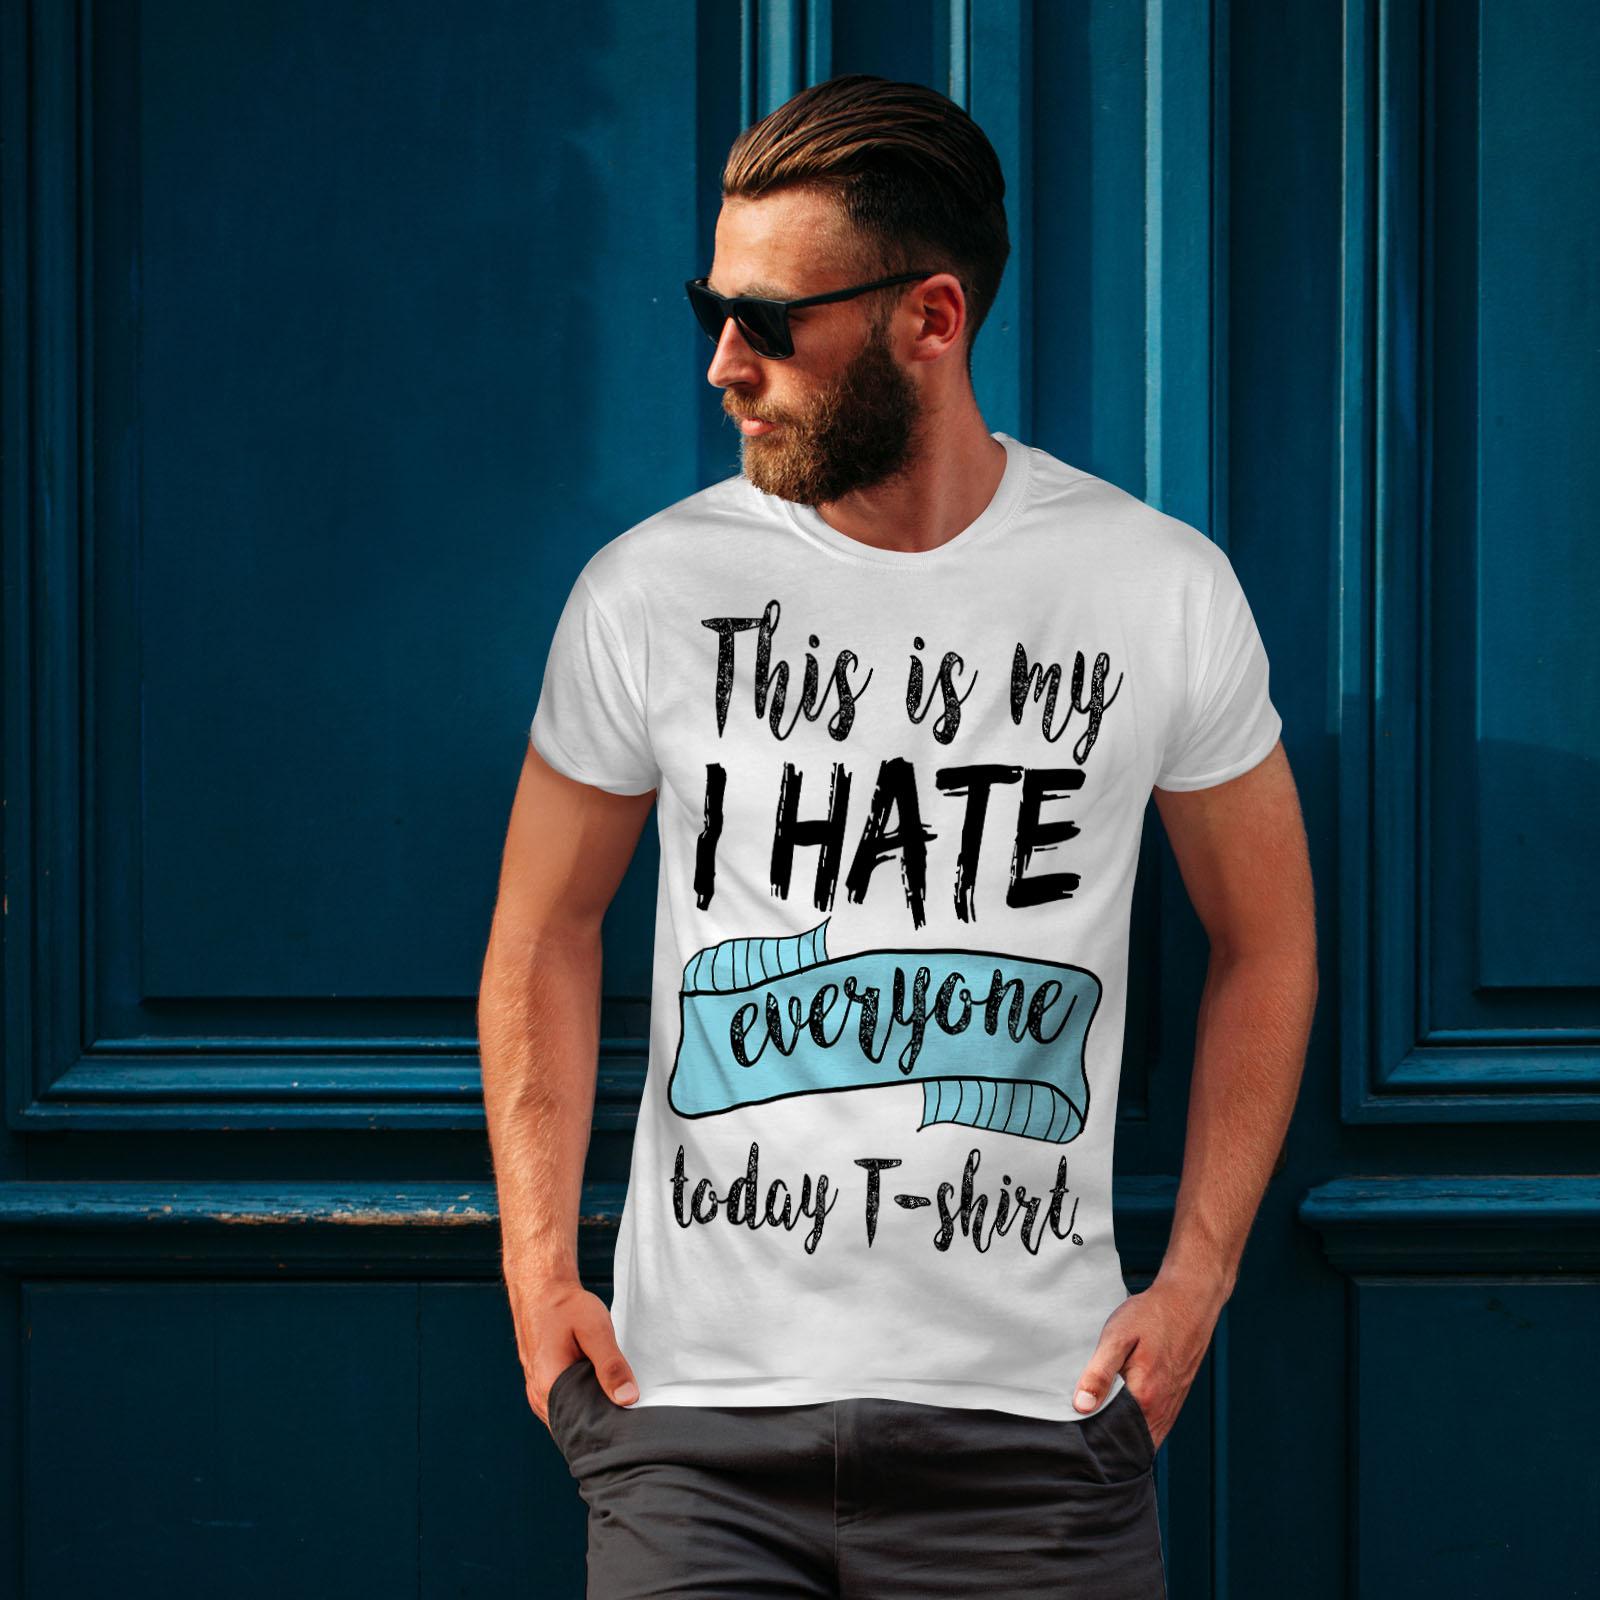 Wellcoda-hasse-alle-heute-Herren-T-Shirt-lustige-Grafikdesign-Printed-Tee Indexbild 10